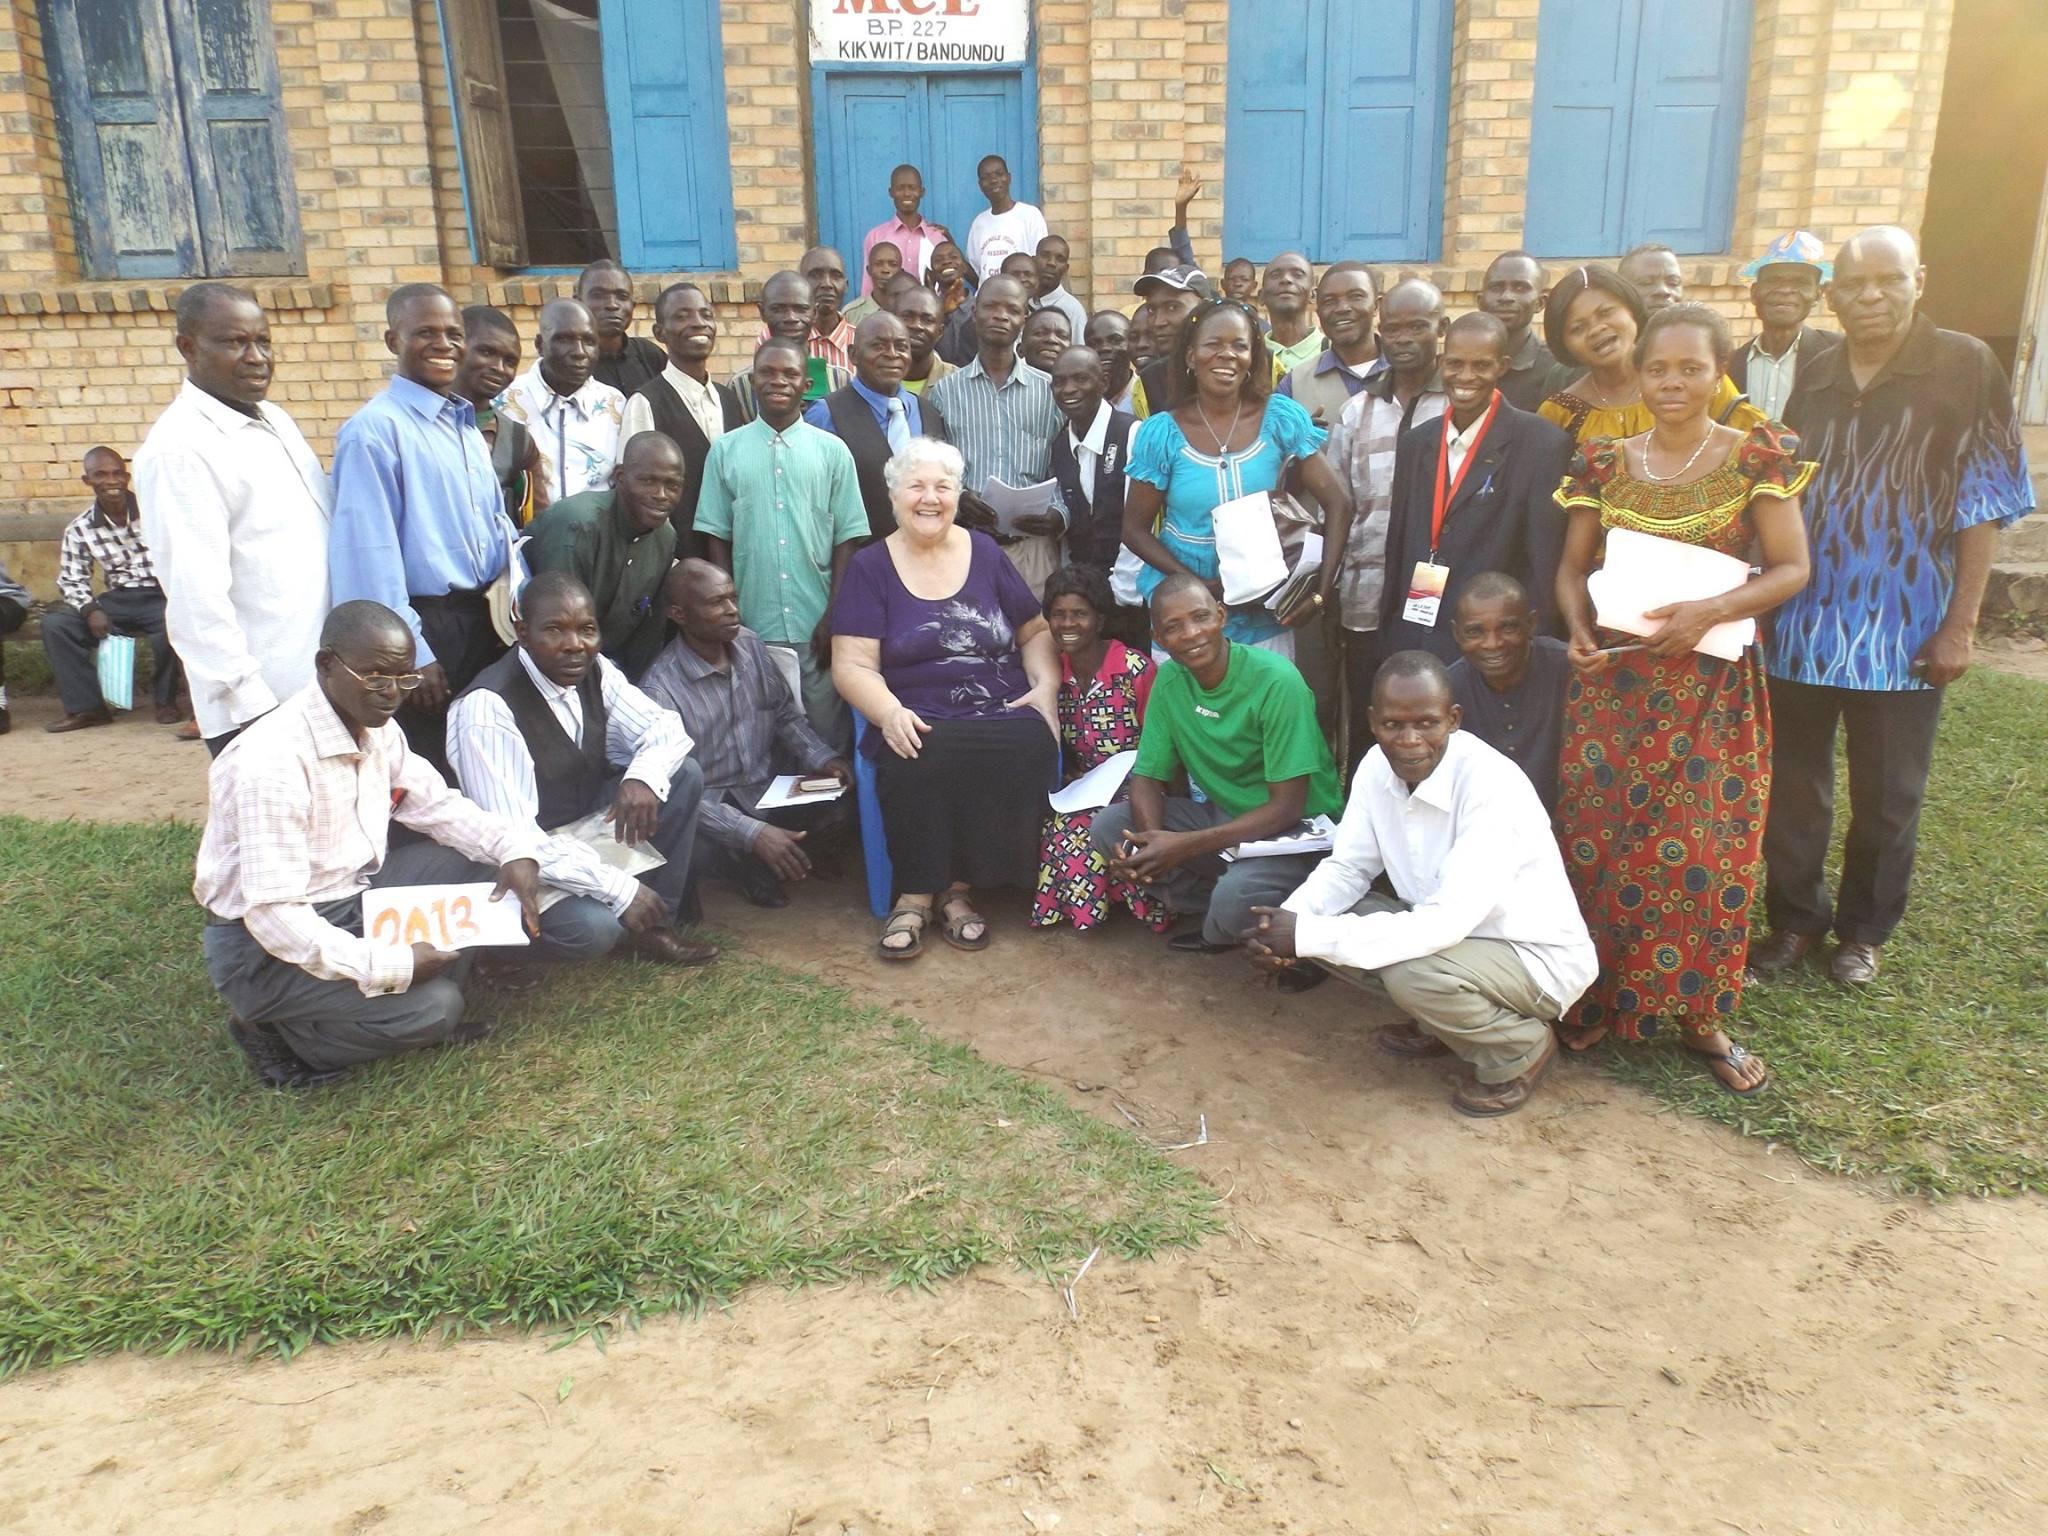 No longer alone: ECM leadership training in the Congo has a reunion